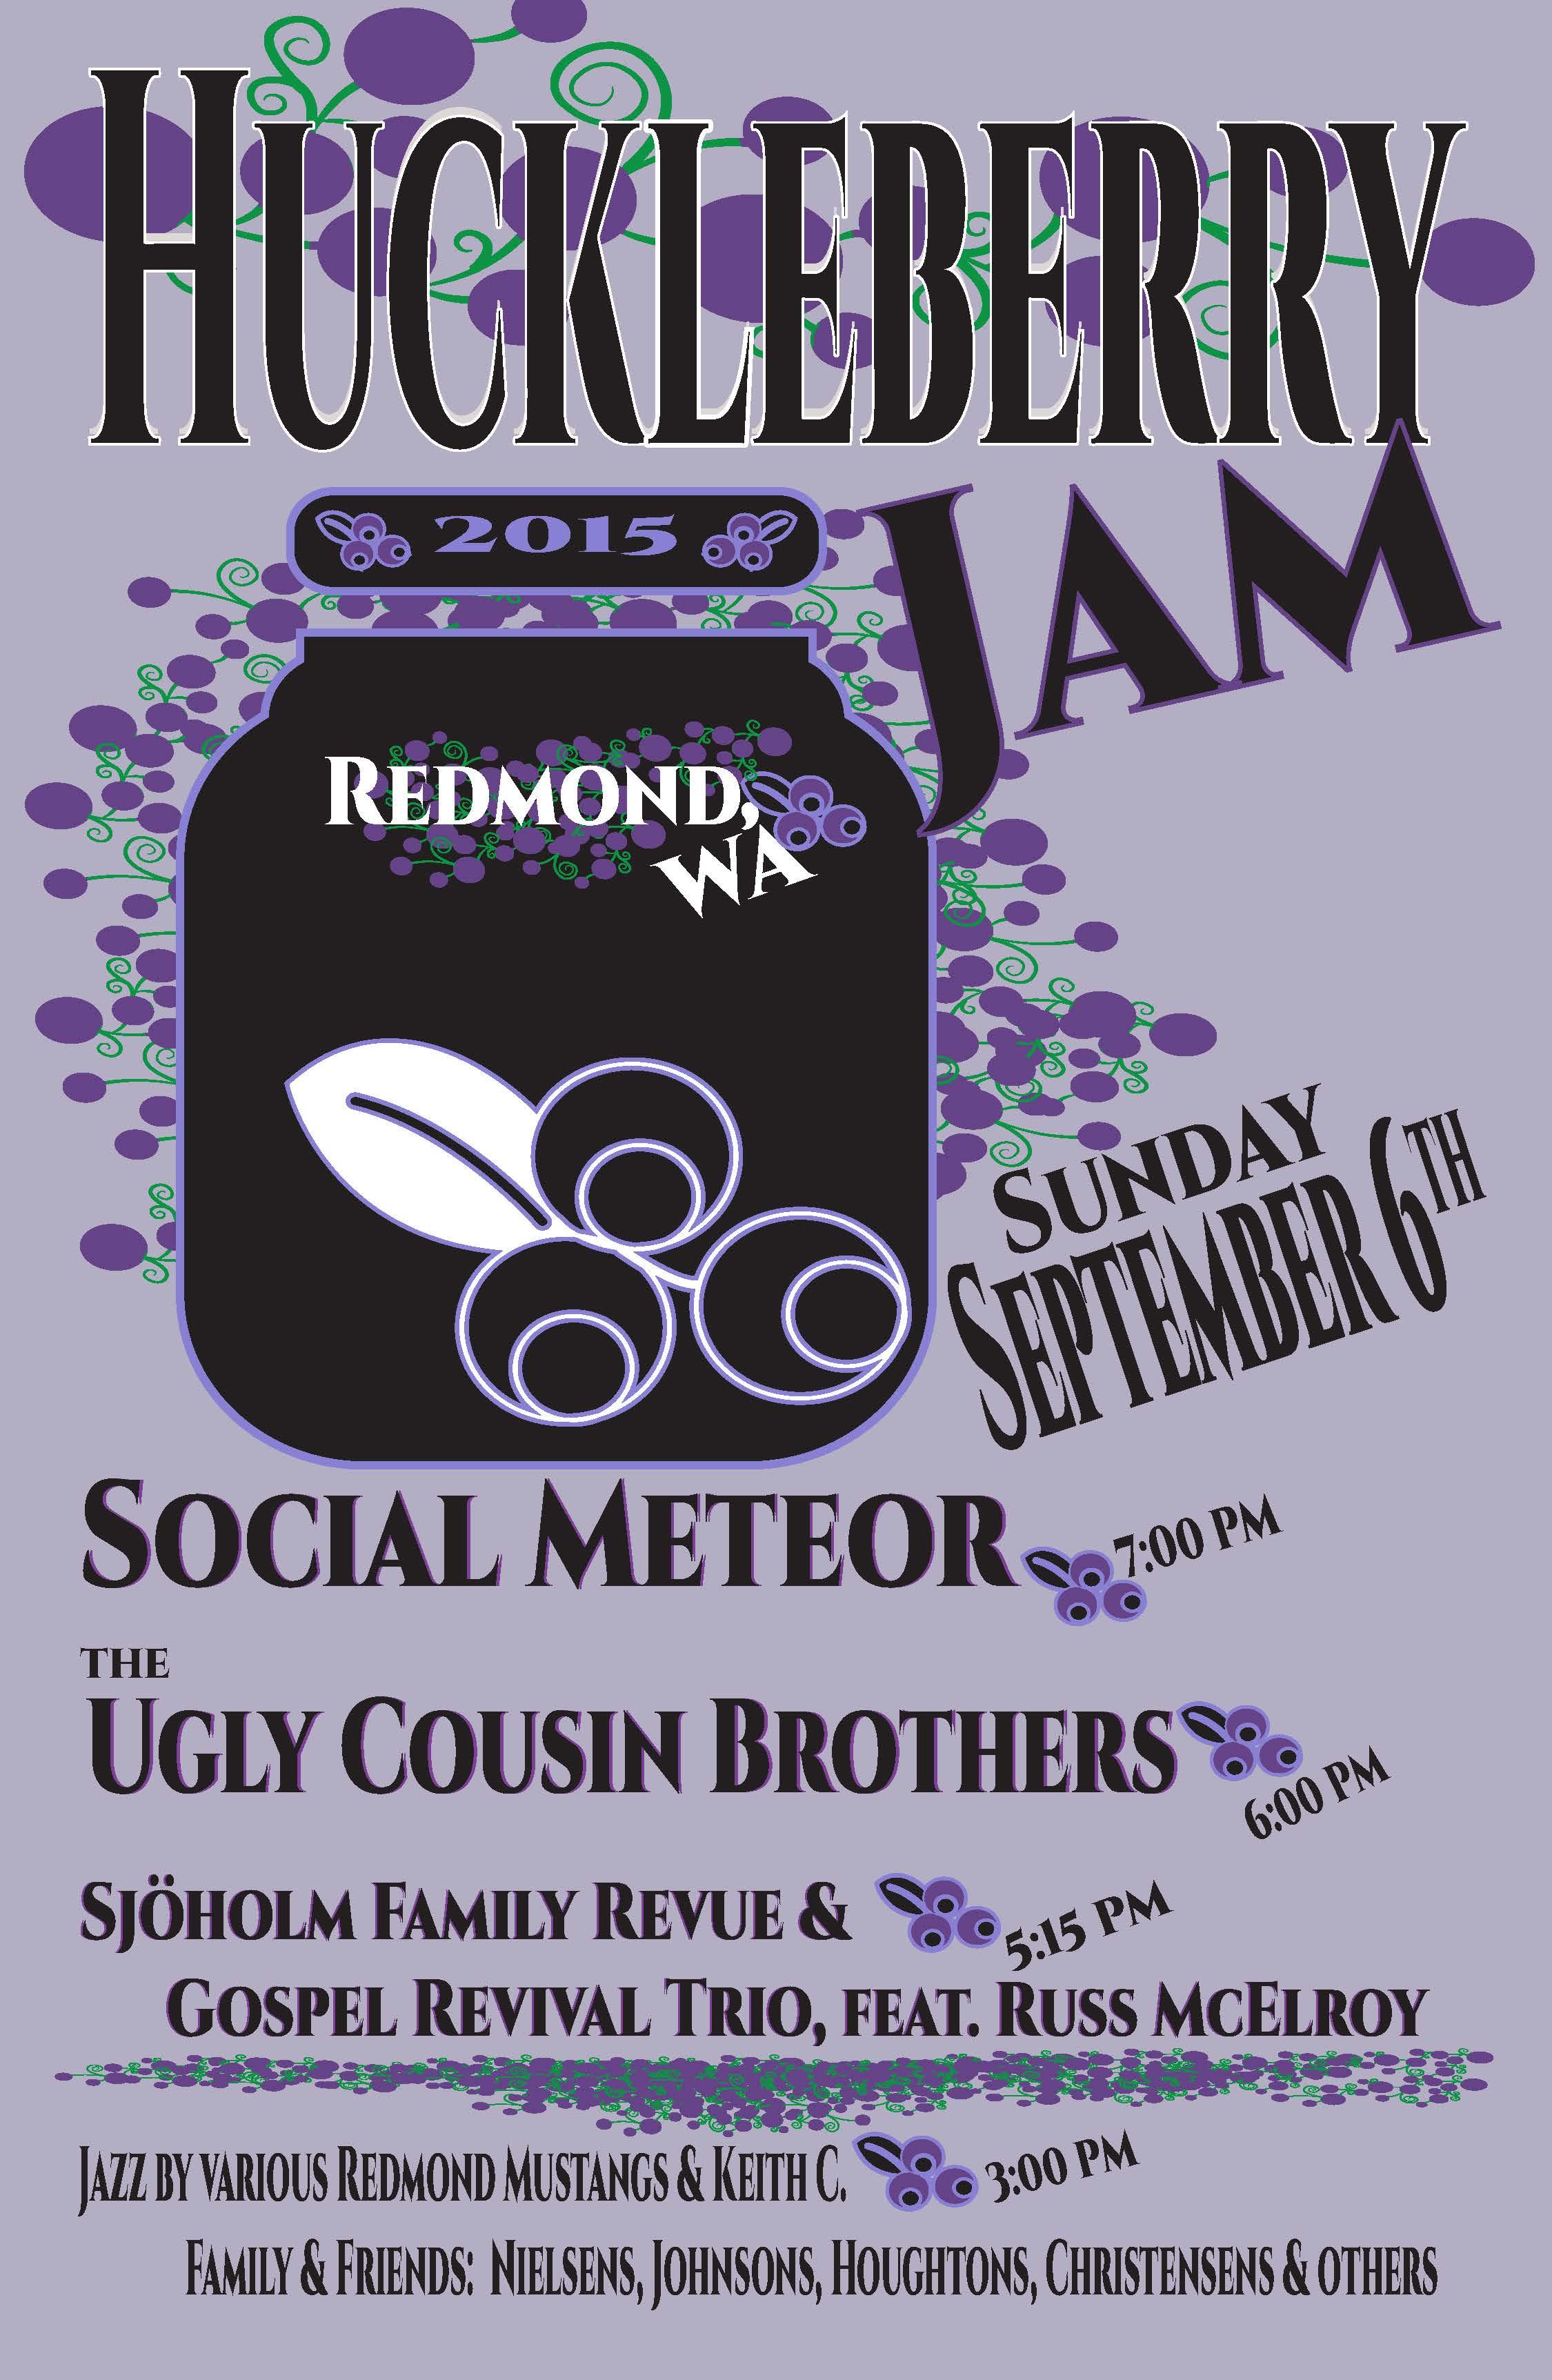 Huckleberry Jam Poster copy.jpg